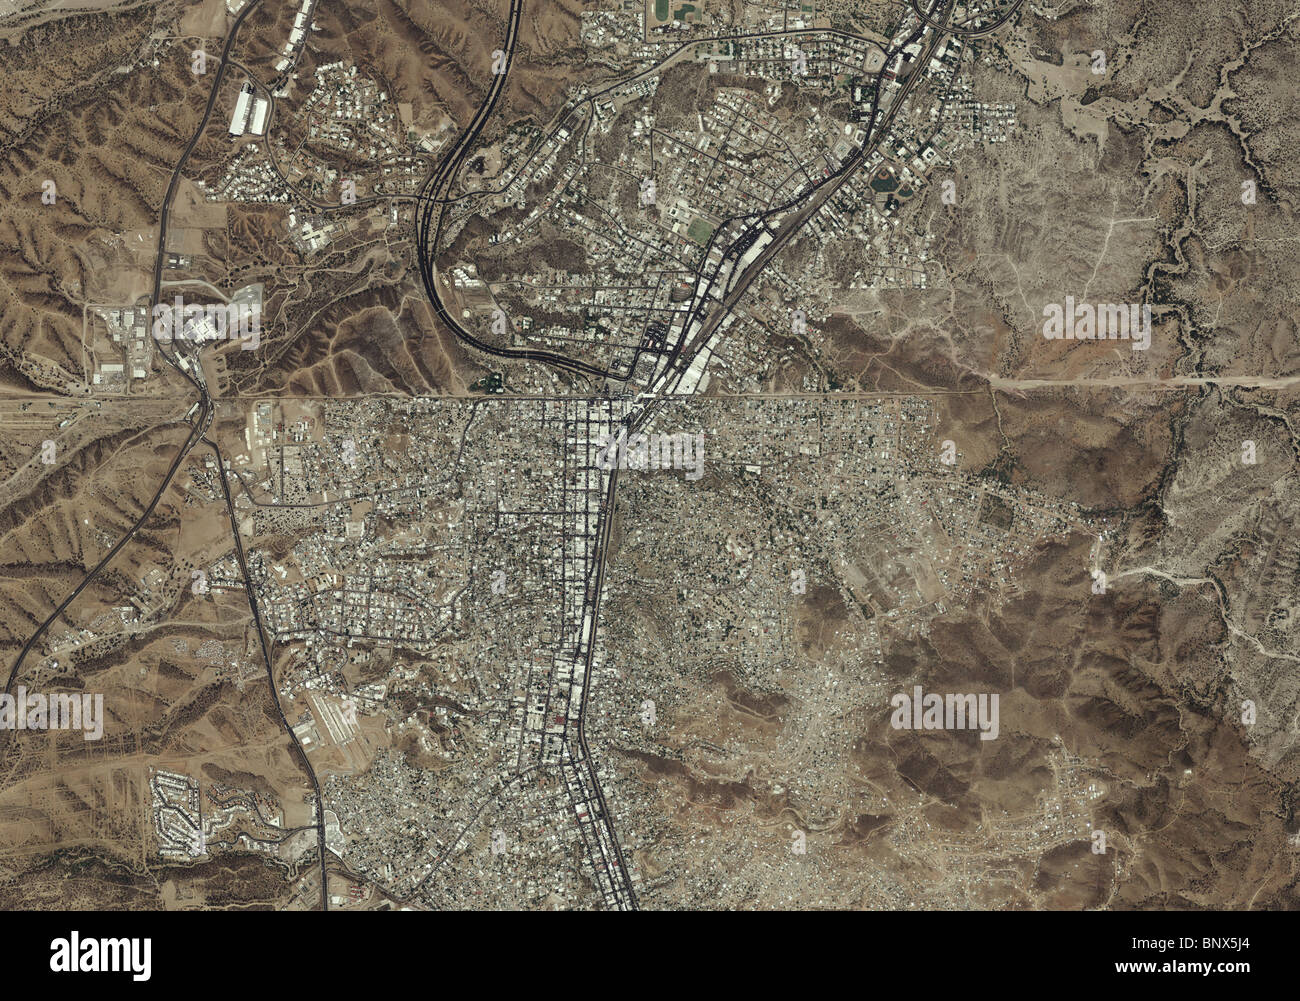 aerial map view above Mexican American border Nogales Arizona Mexico